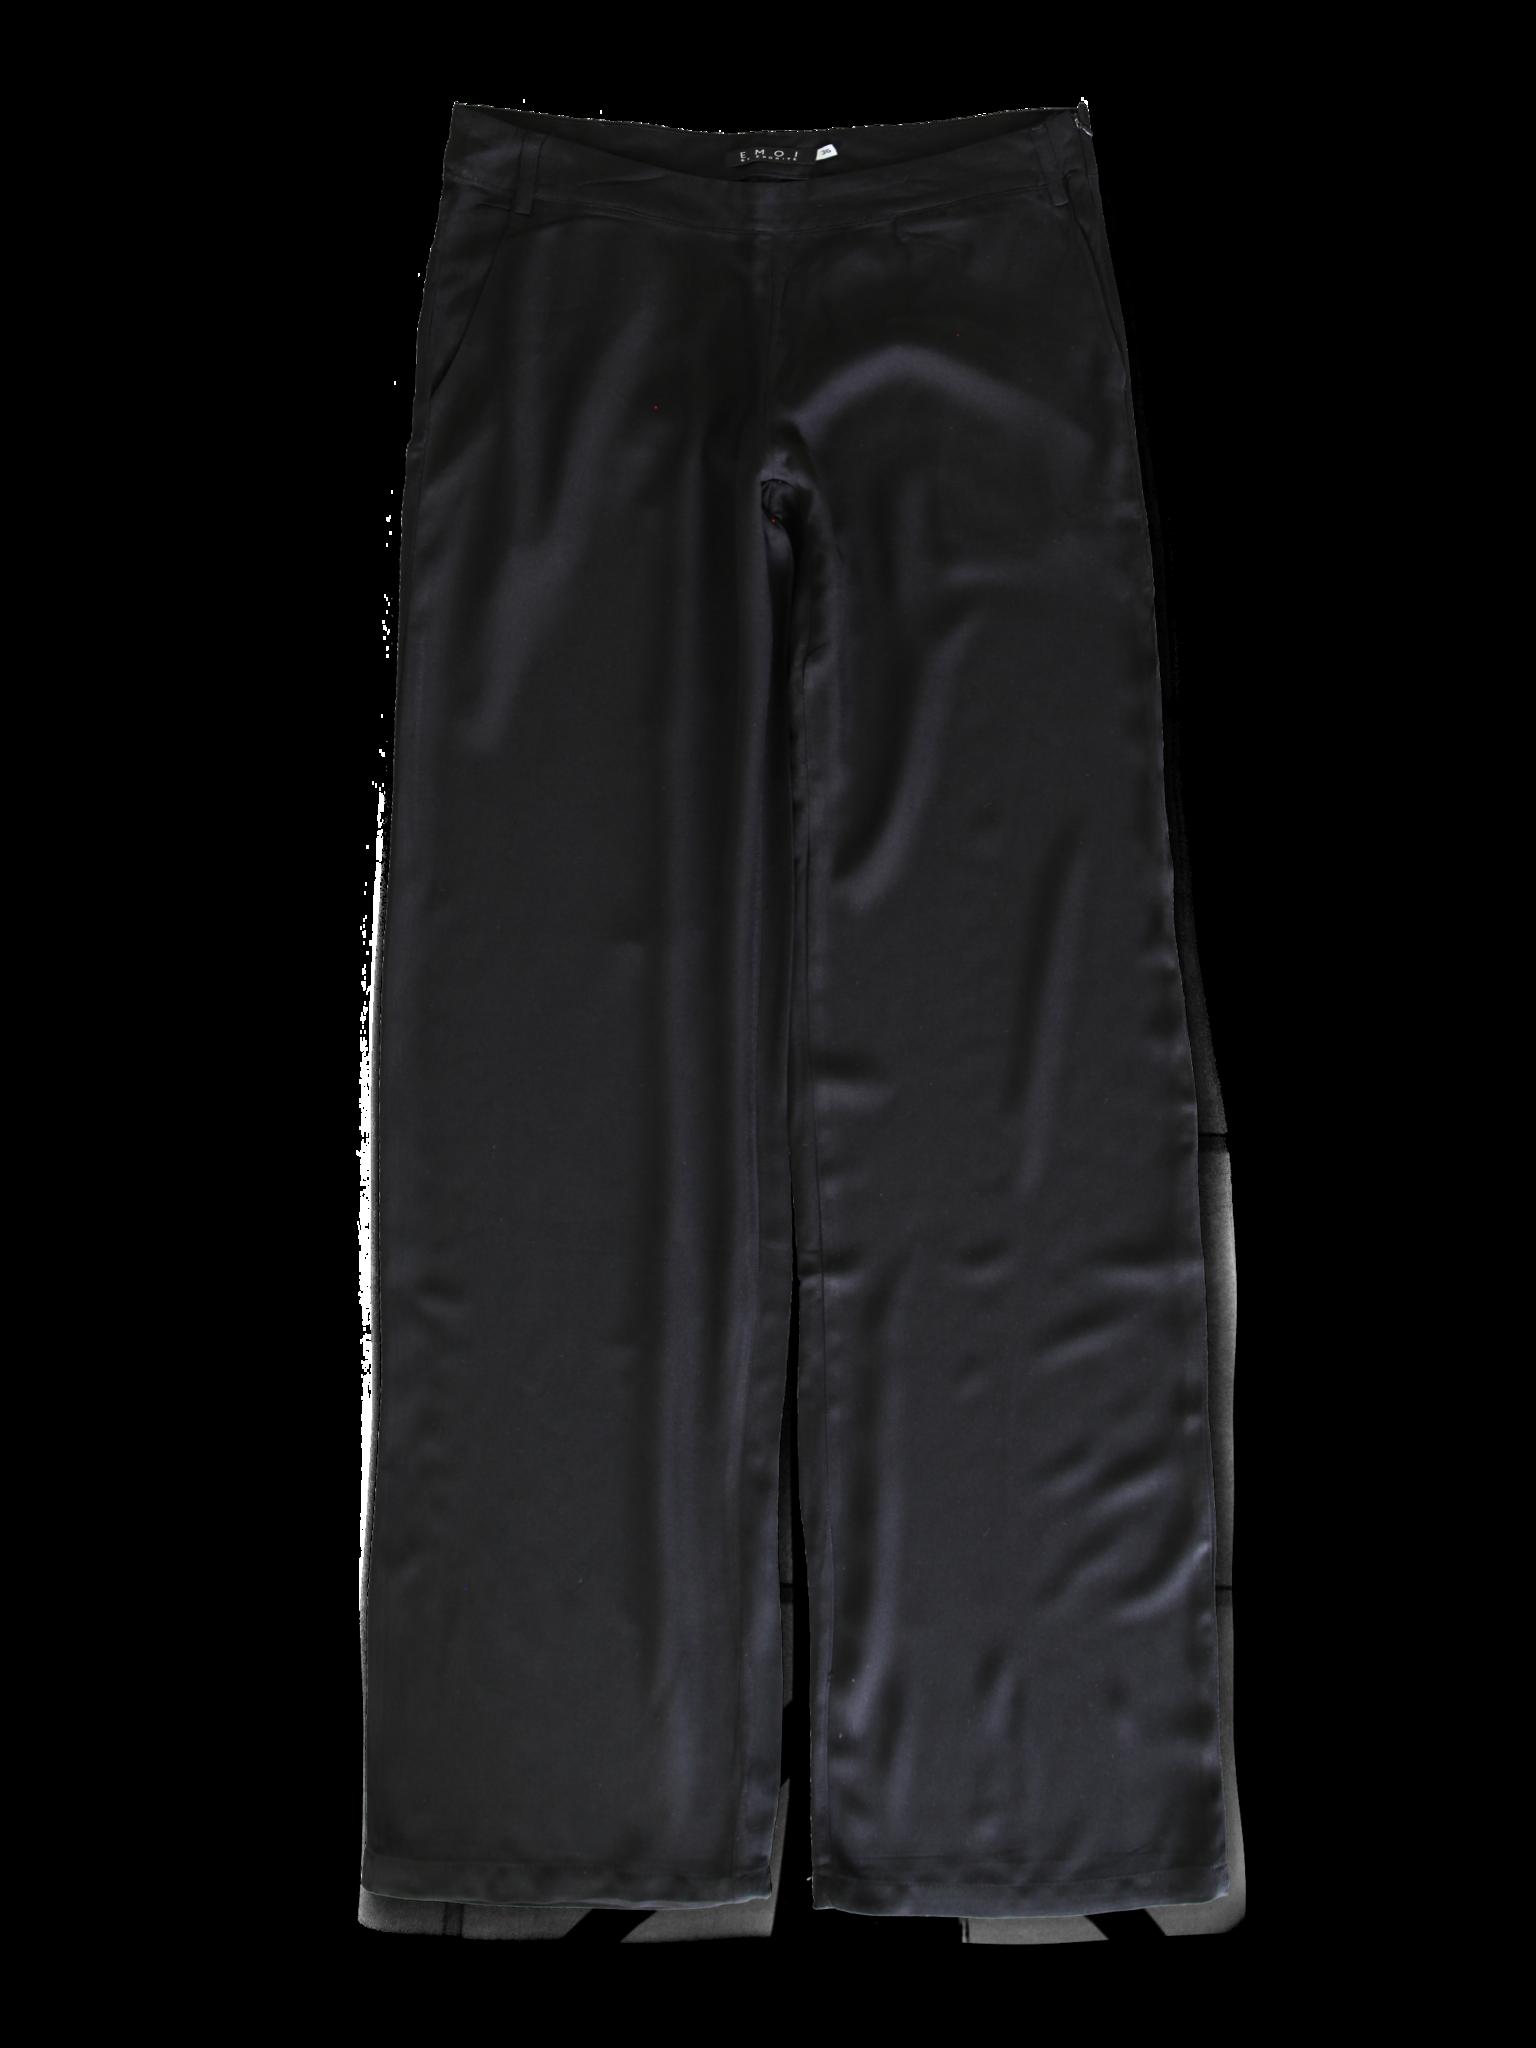 Emoi | Summer 2020 Ladies | Pants | 18 pcs/box